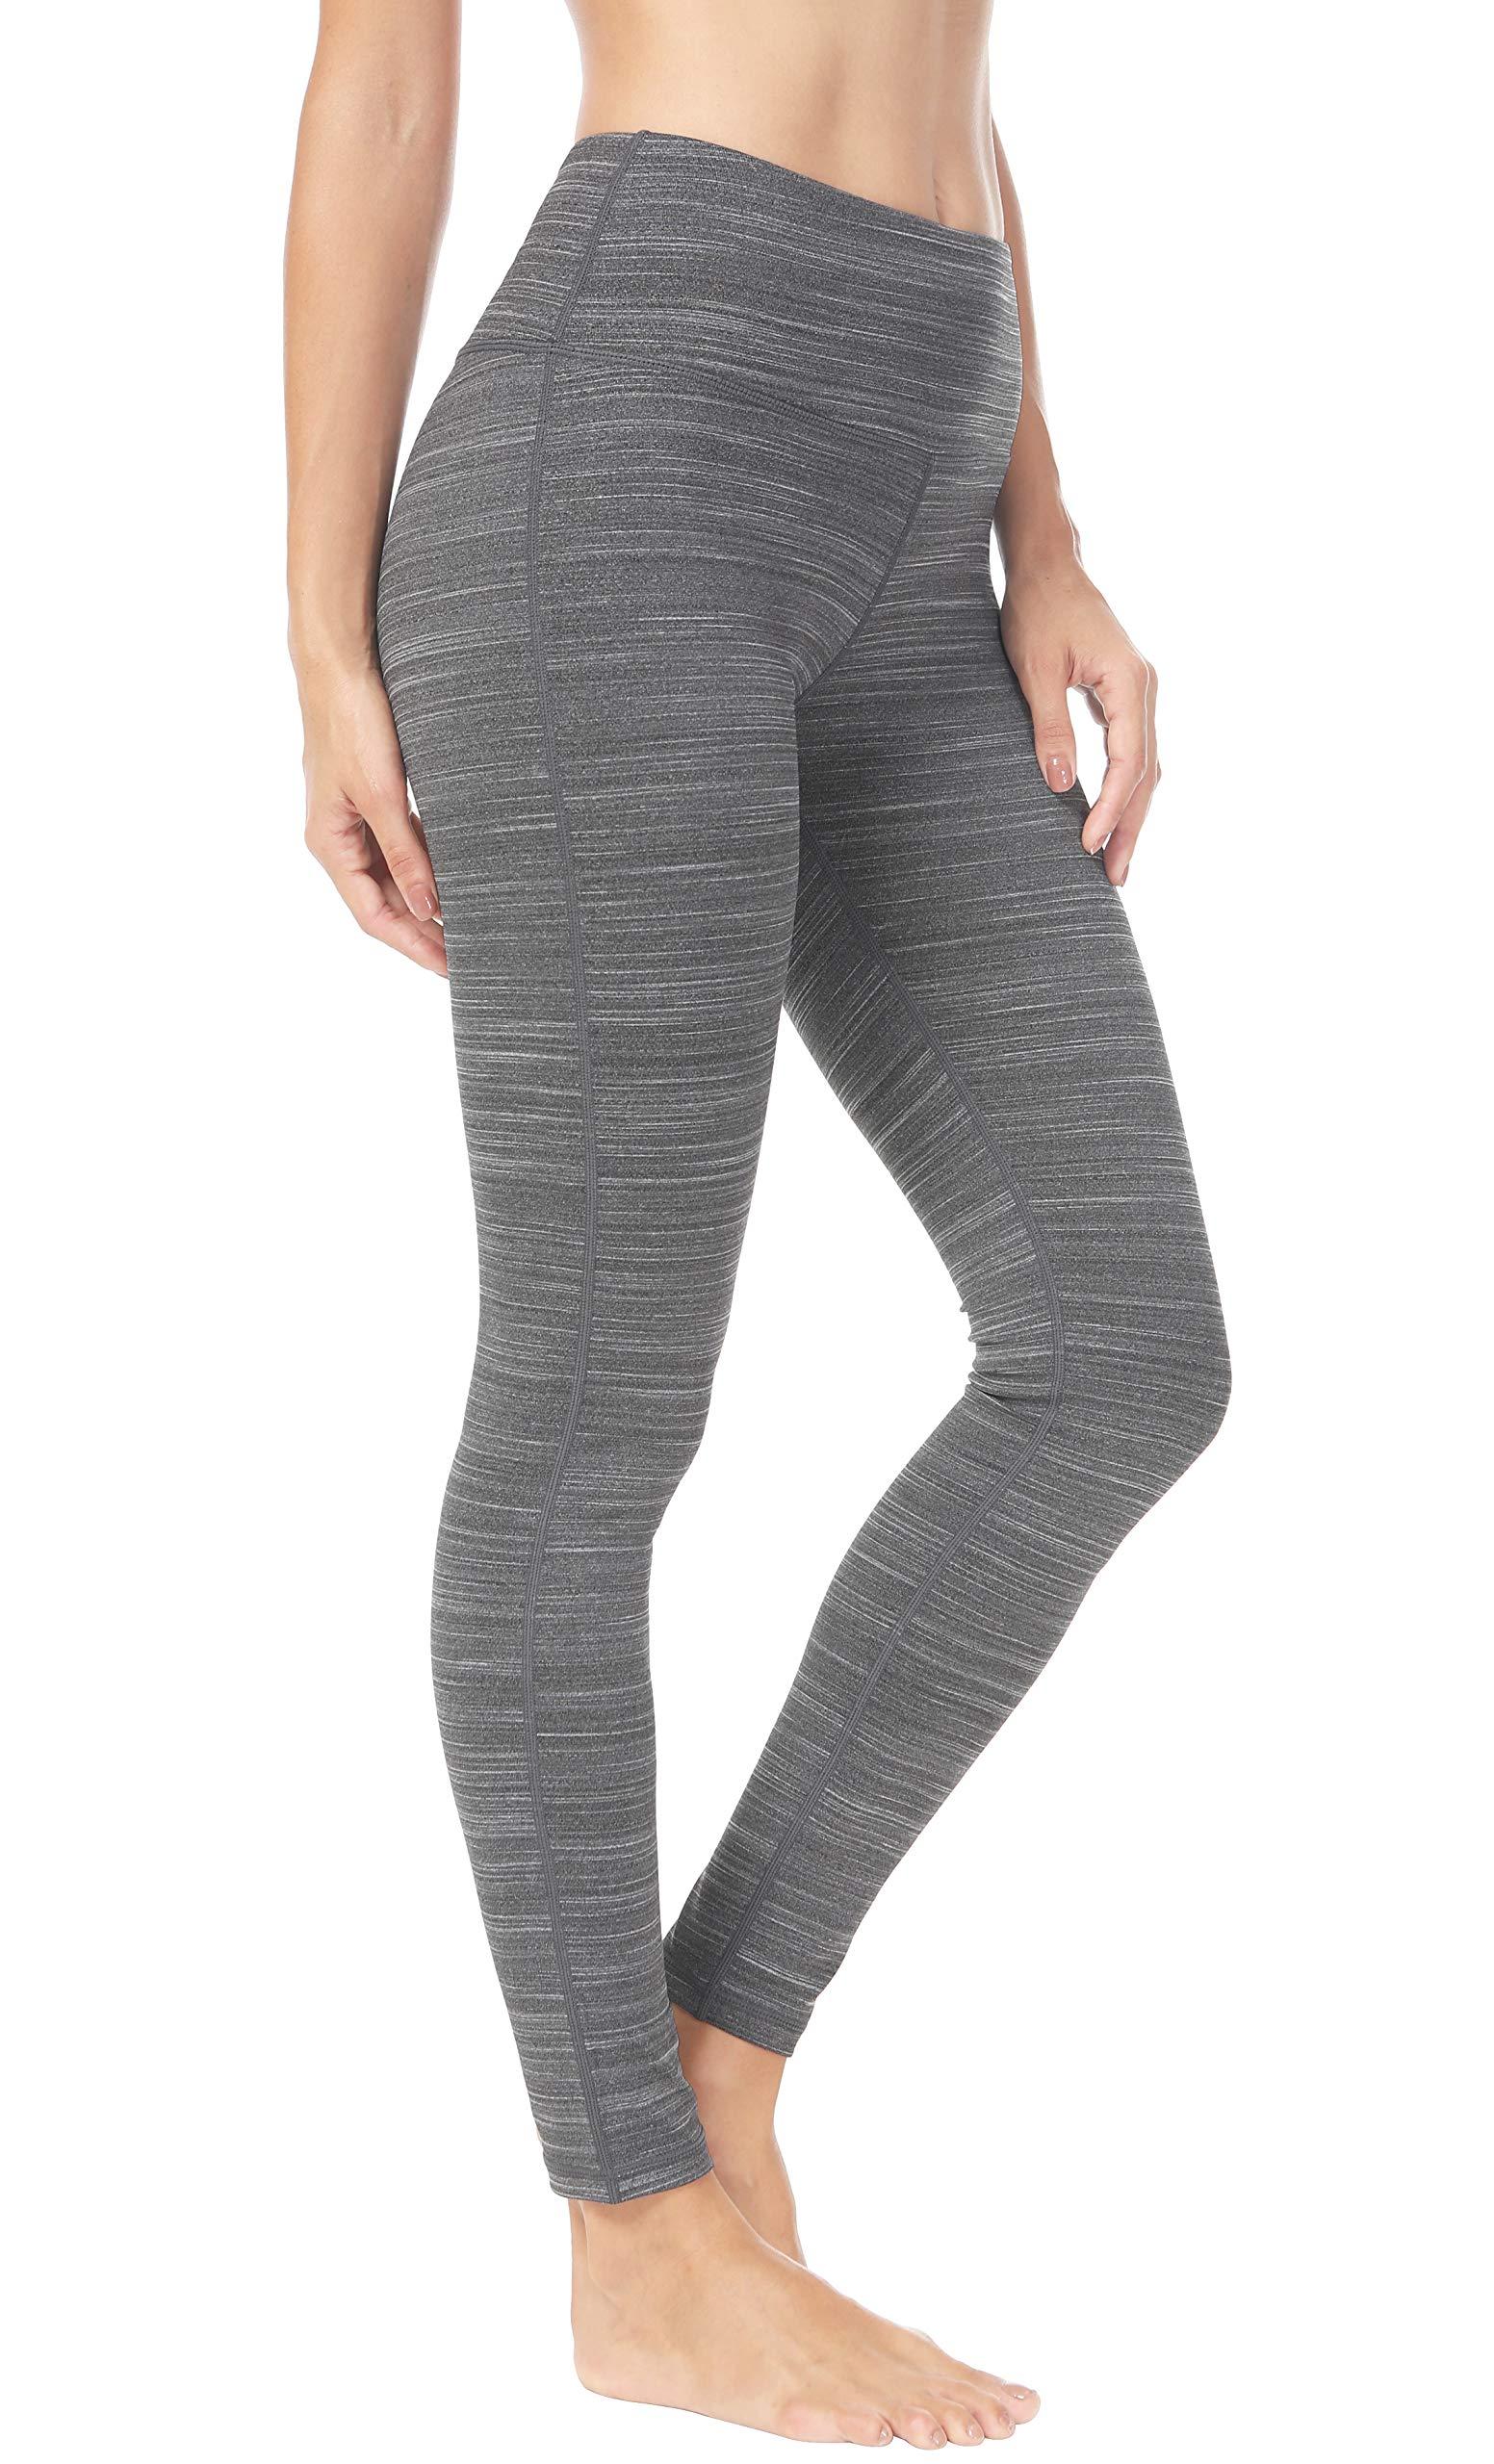 Queenie Ke Women Mid-aist Hidden Pockets Sport Legging Yoga Pants Running Tights Size XS Color Charcoal Grey